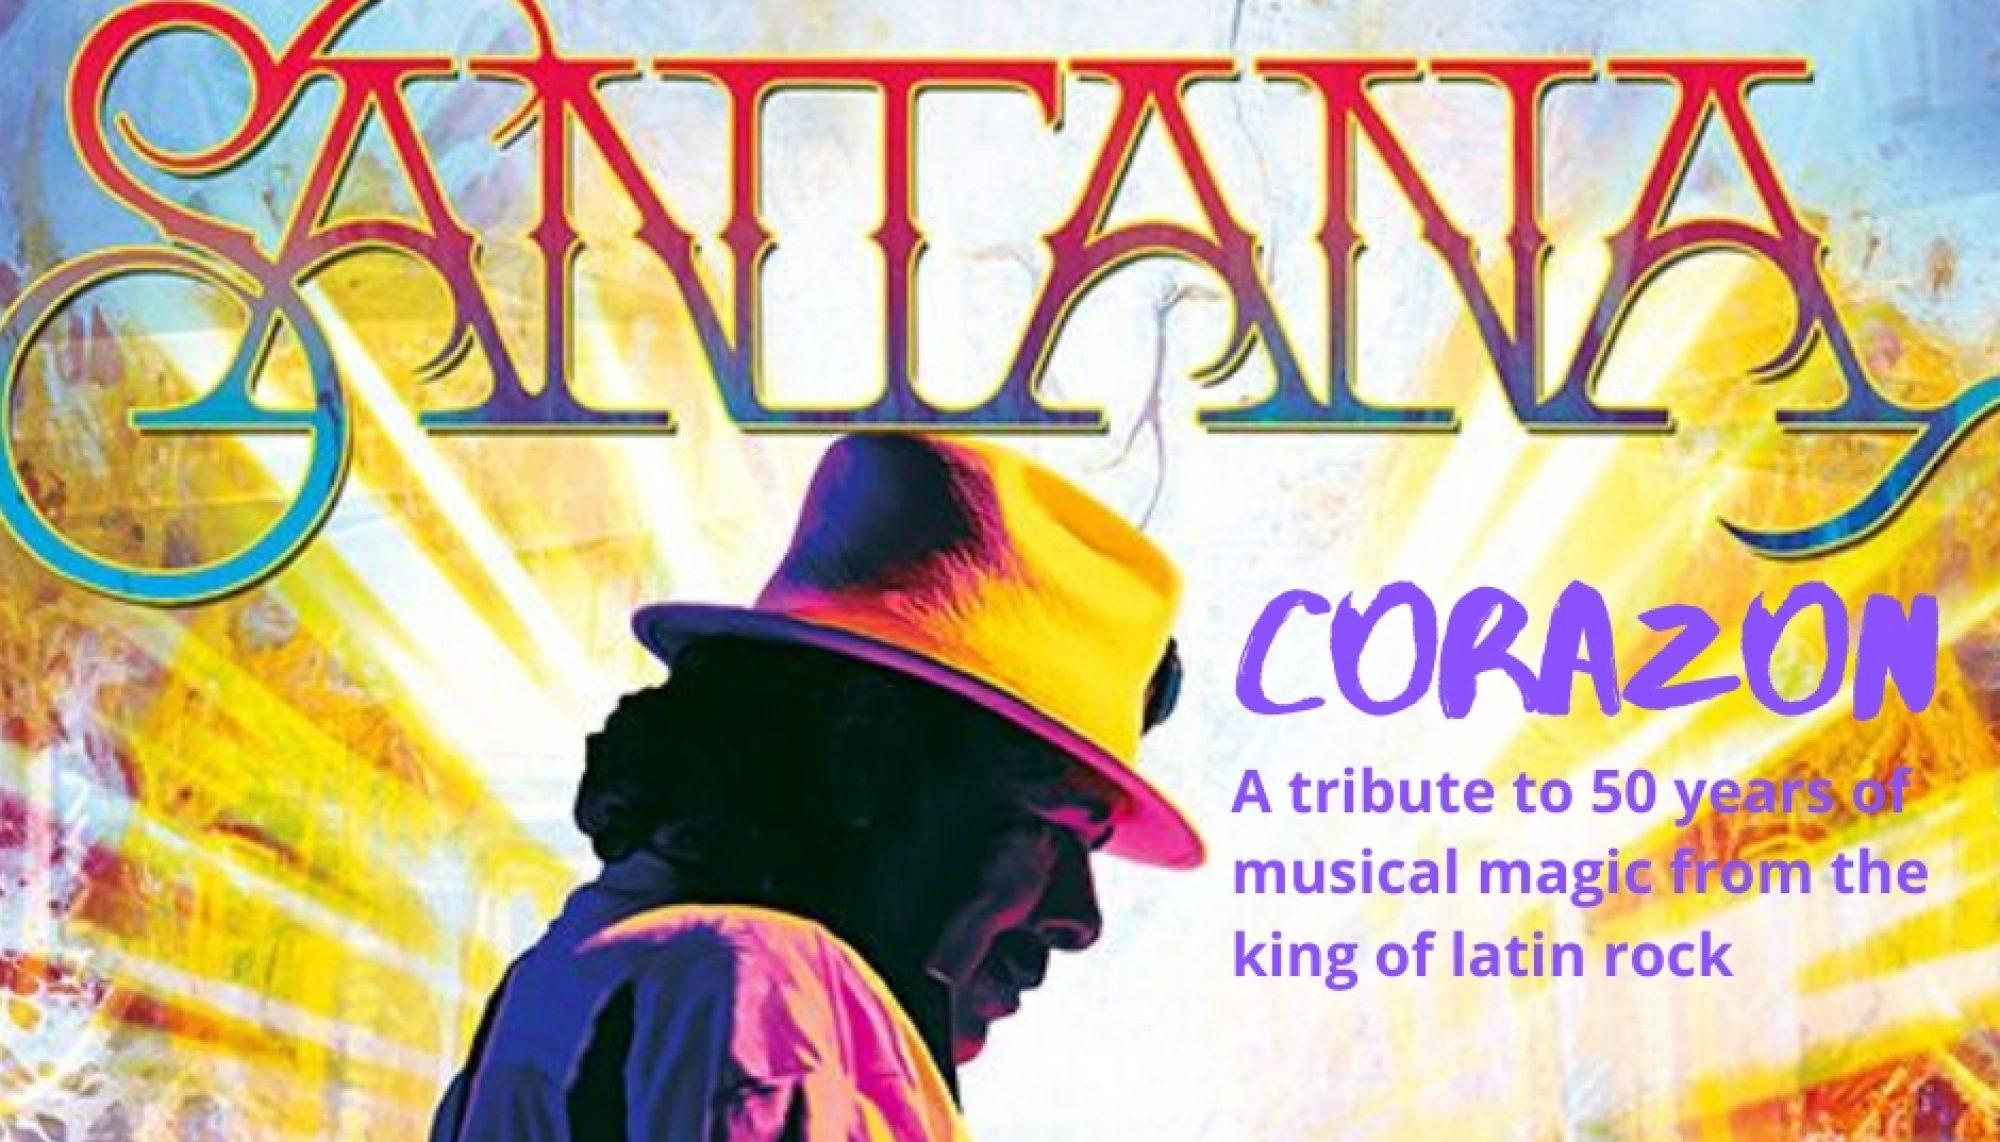 Corazon - the heart and soul of Santana